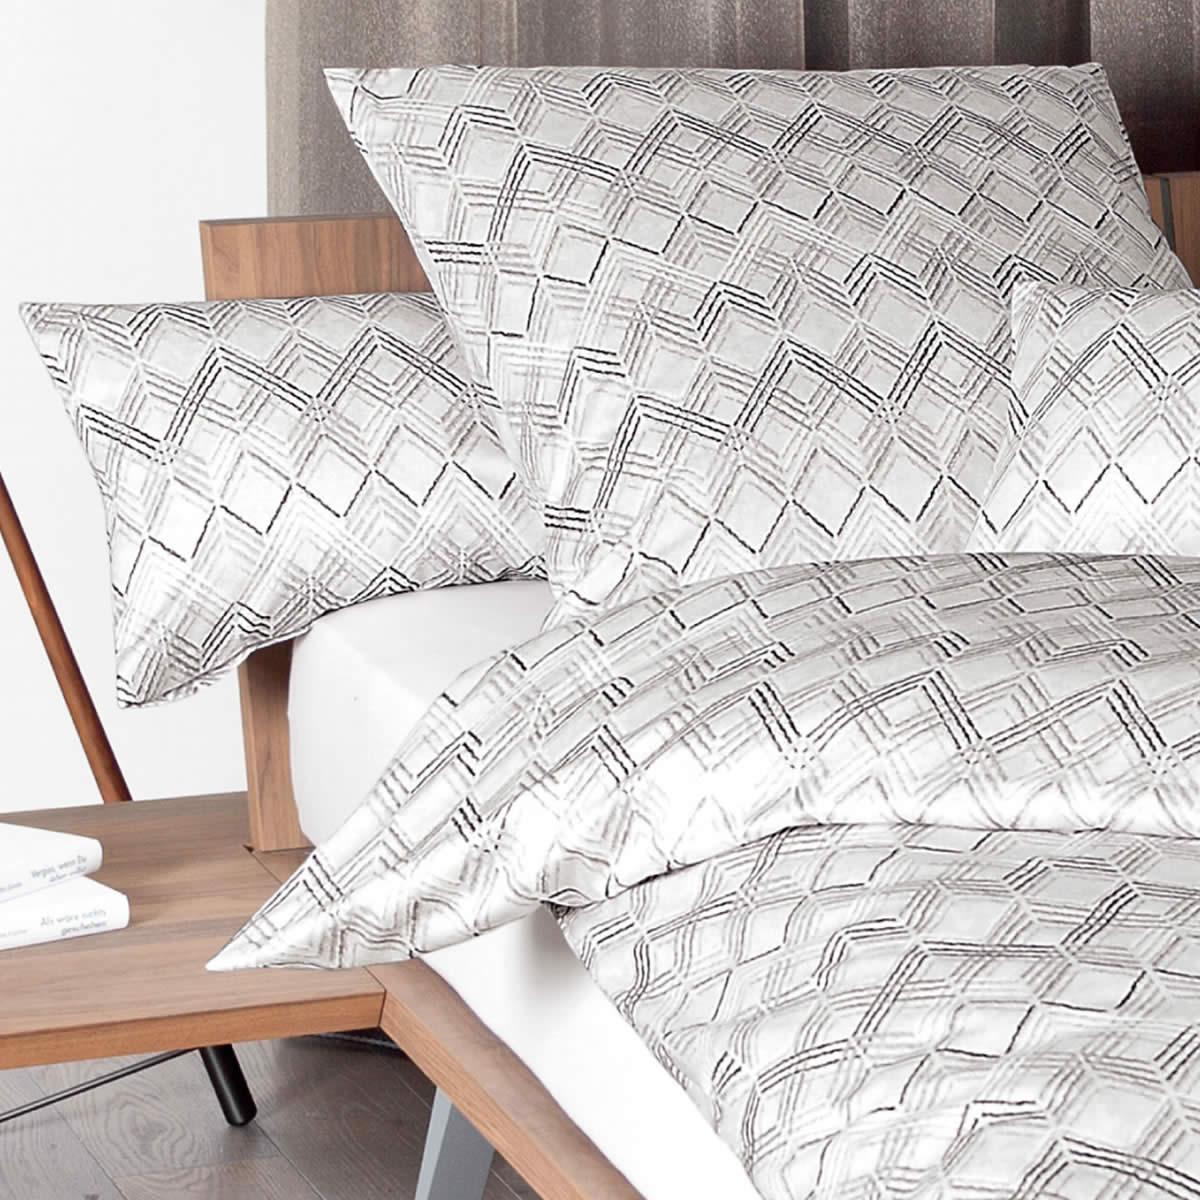 janine interlock fein jersey bettw sche carmen 53032 07 taupe sand. Black Bedroom Furniture Sets. Home Design Ideas